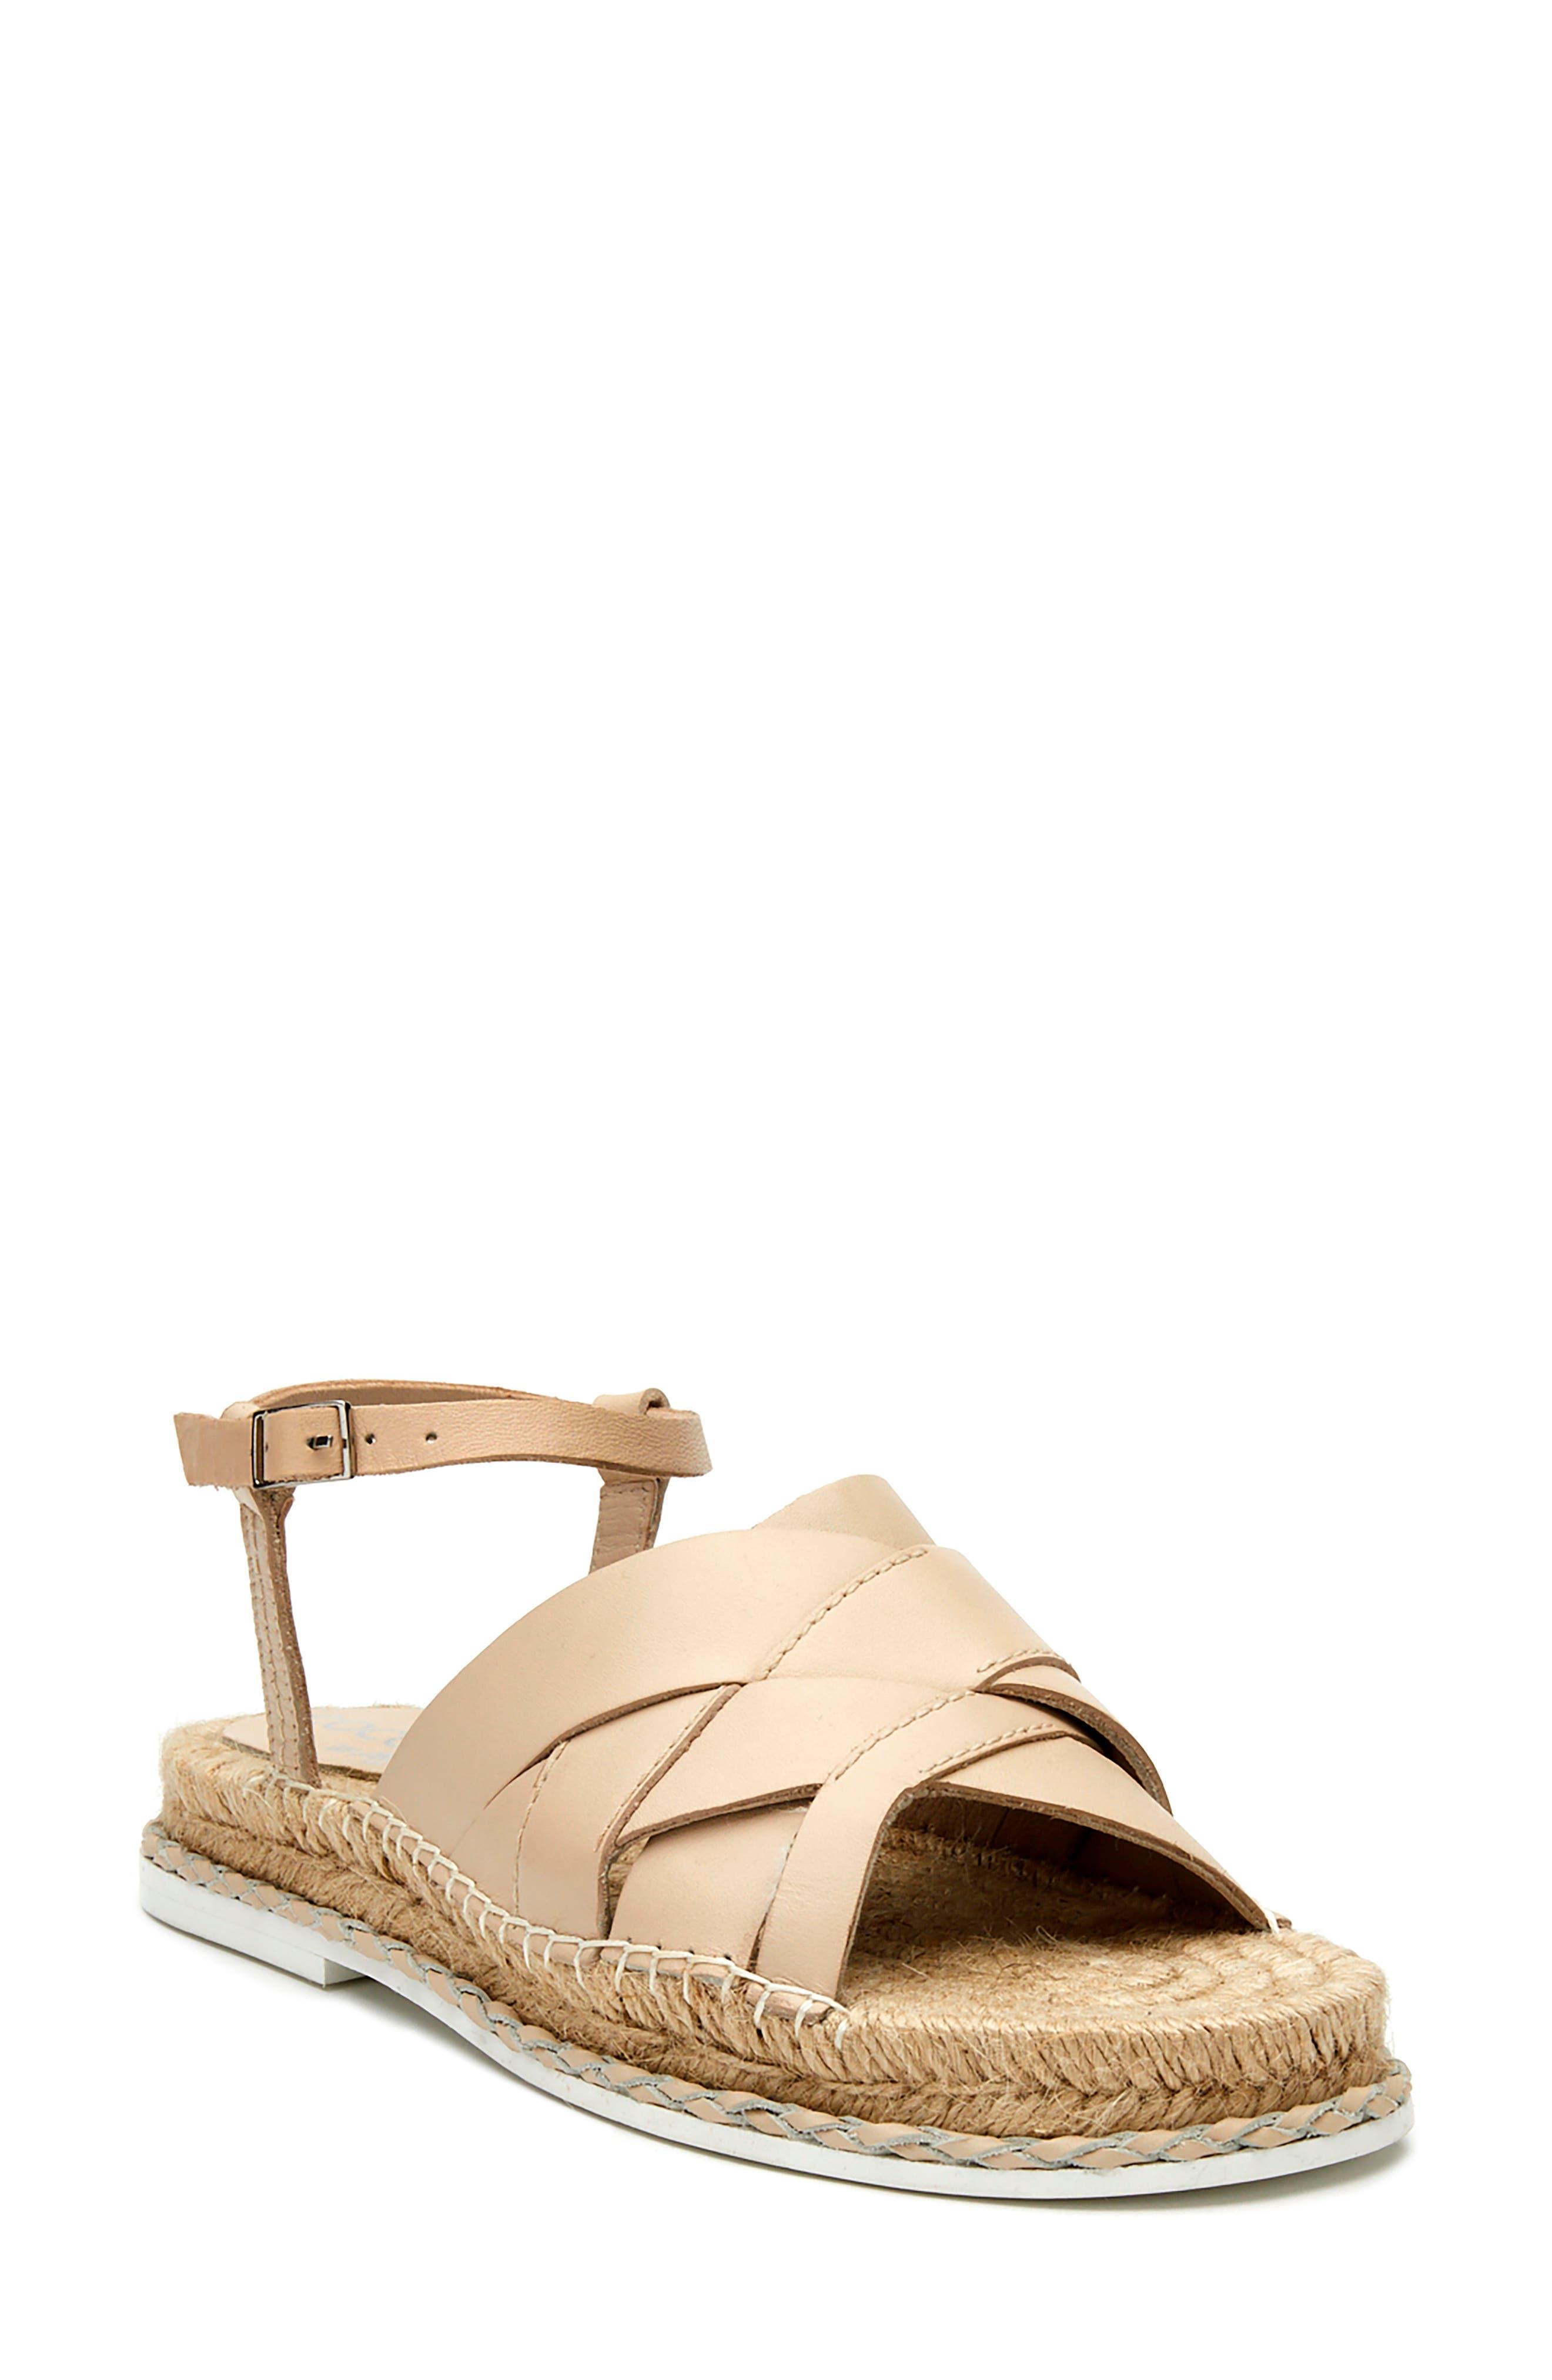 Nicolette Ankle Strap Espadrille Sandal